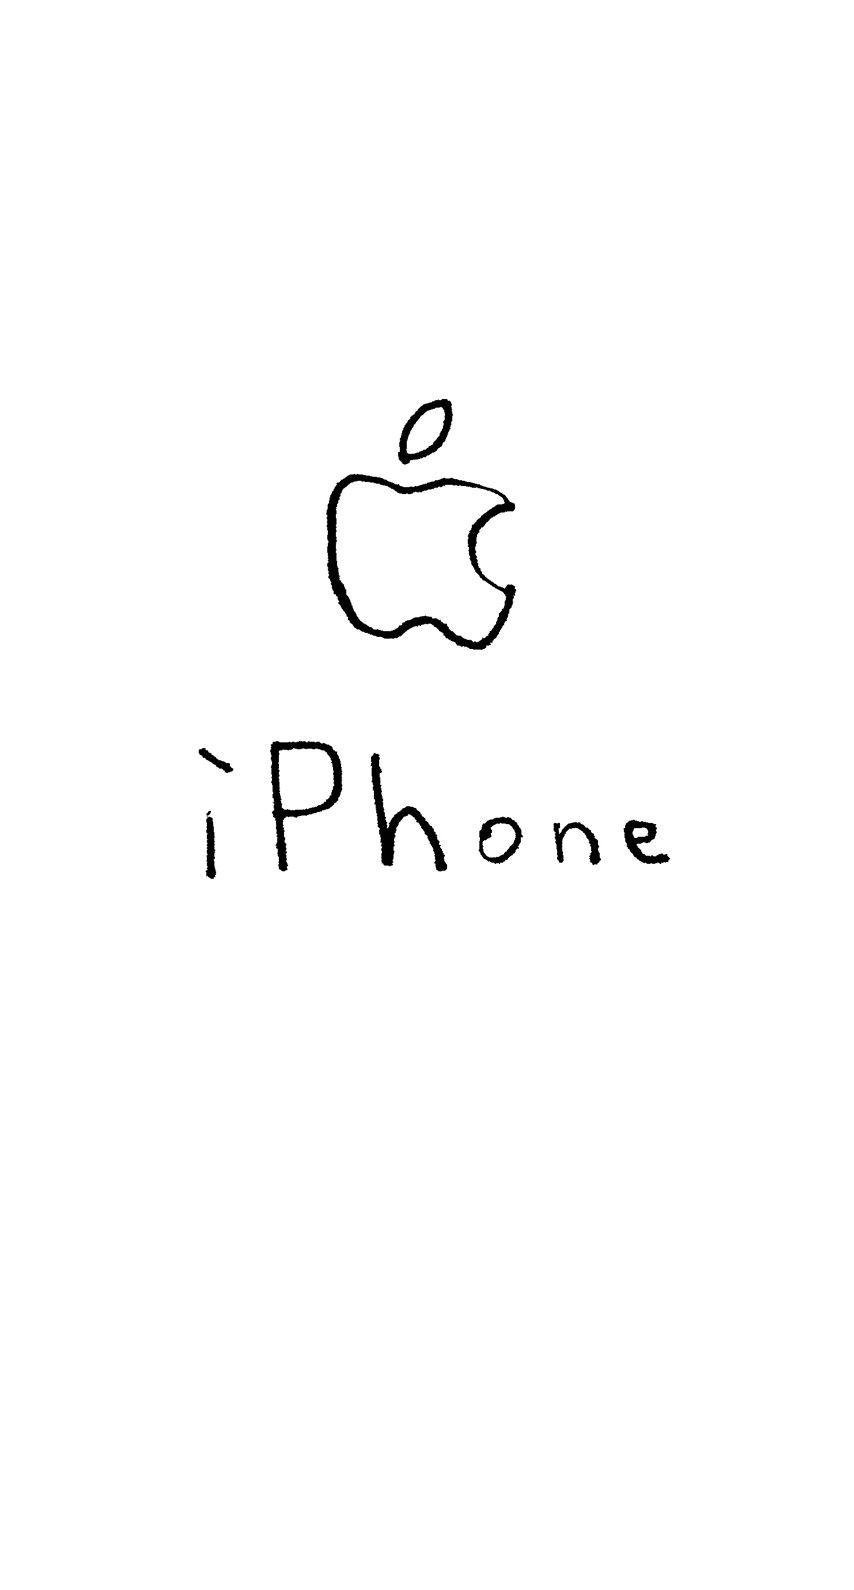 Illustrations Apple Logo IPhone White Wallpapersc IPhone6 Wallpaper Iphone